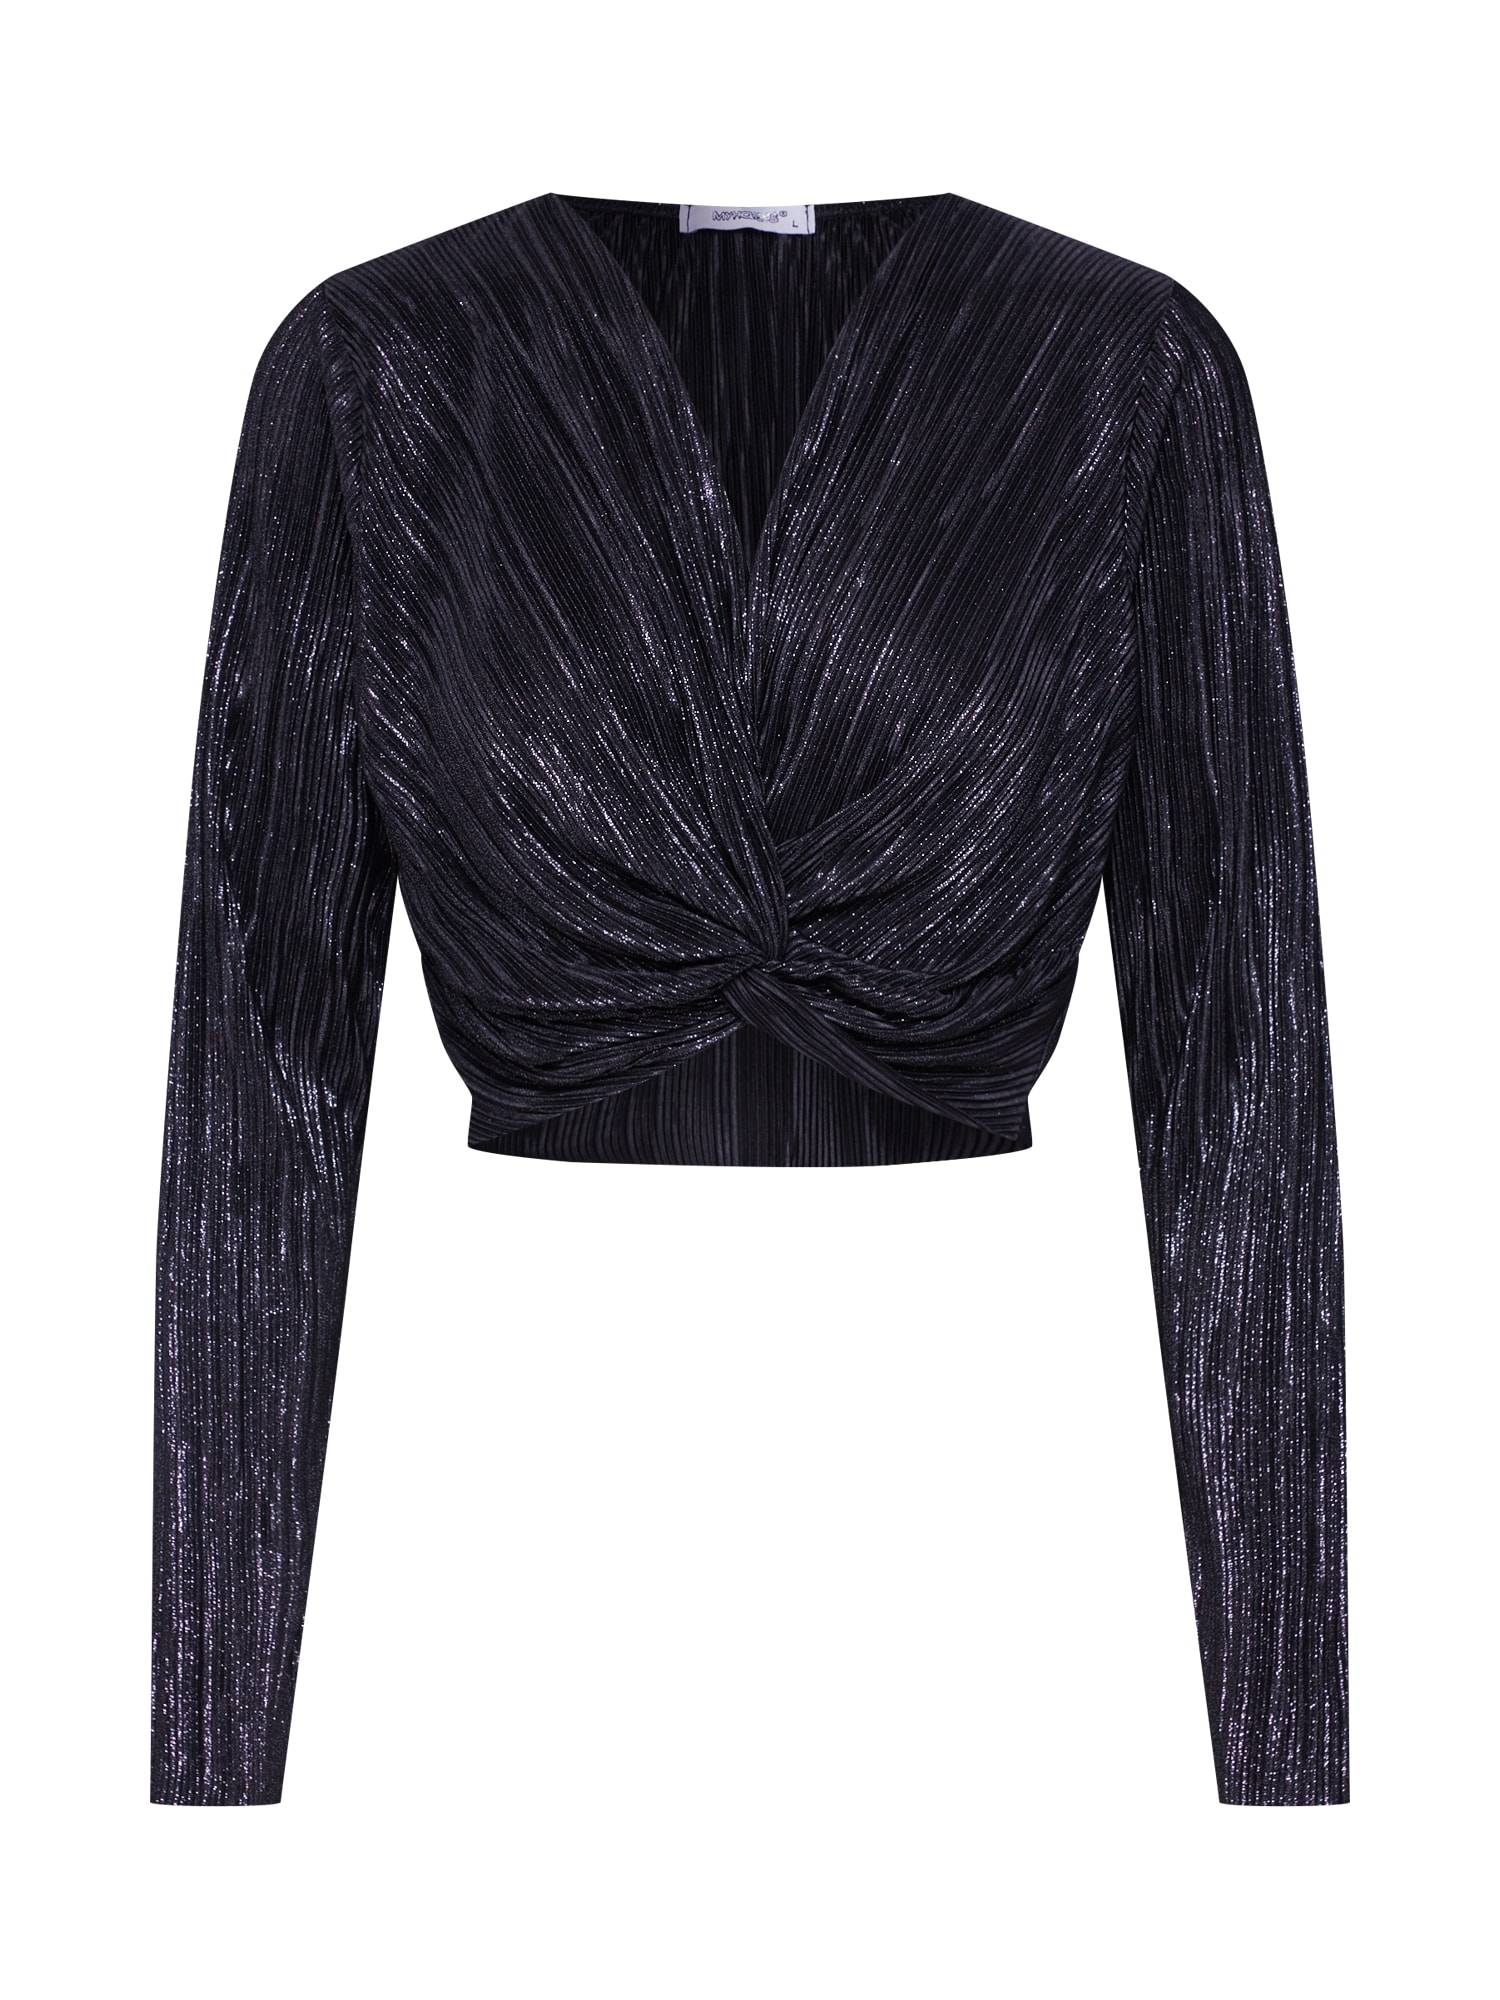 Hailys T-shirt 'LS P TP Lya'  - Noir - Taille: XL - female